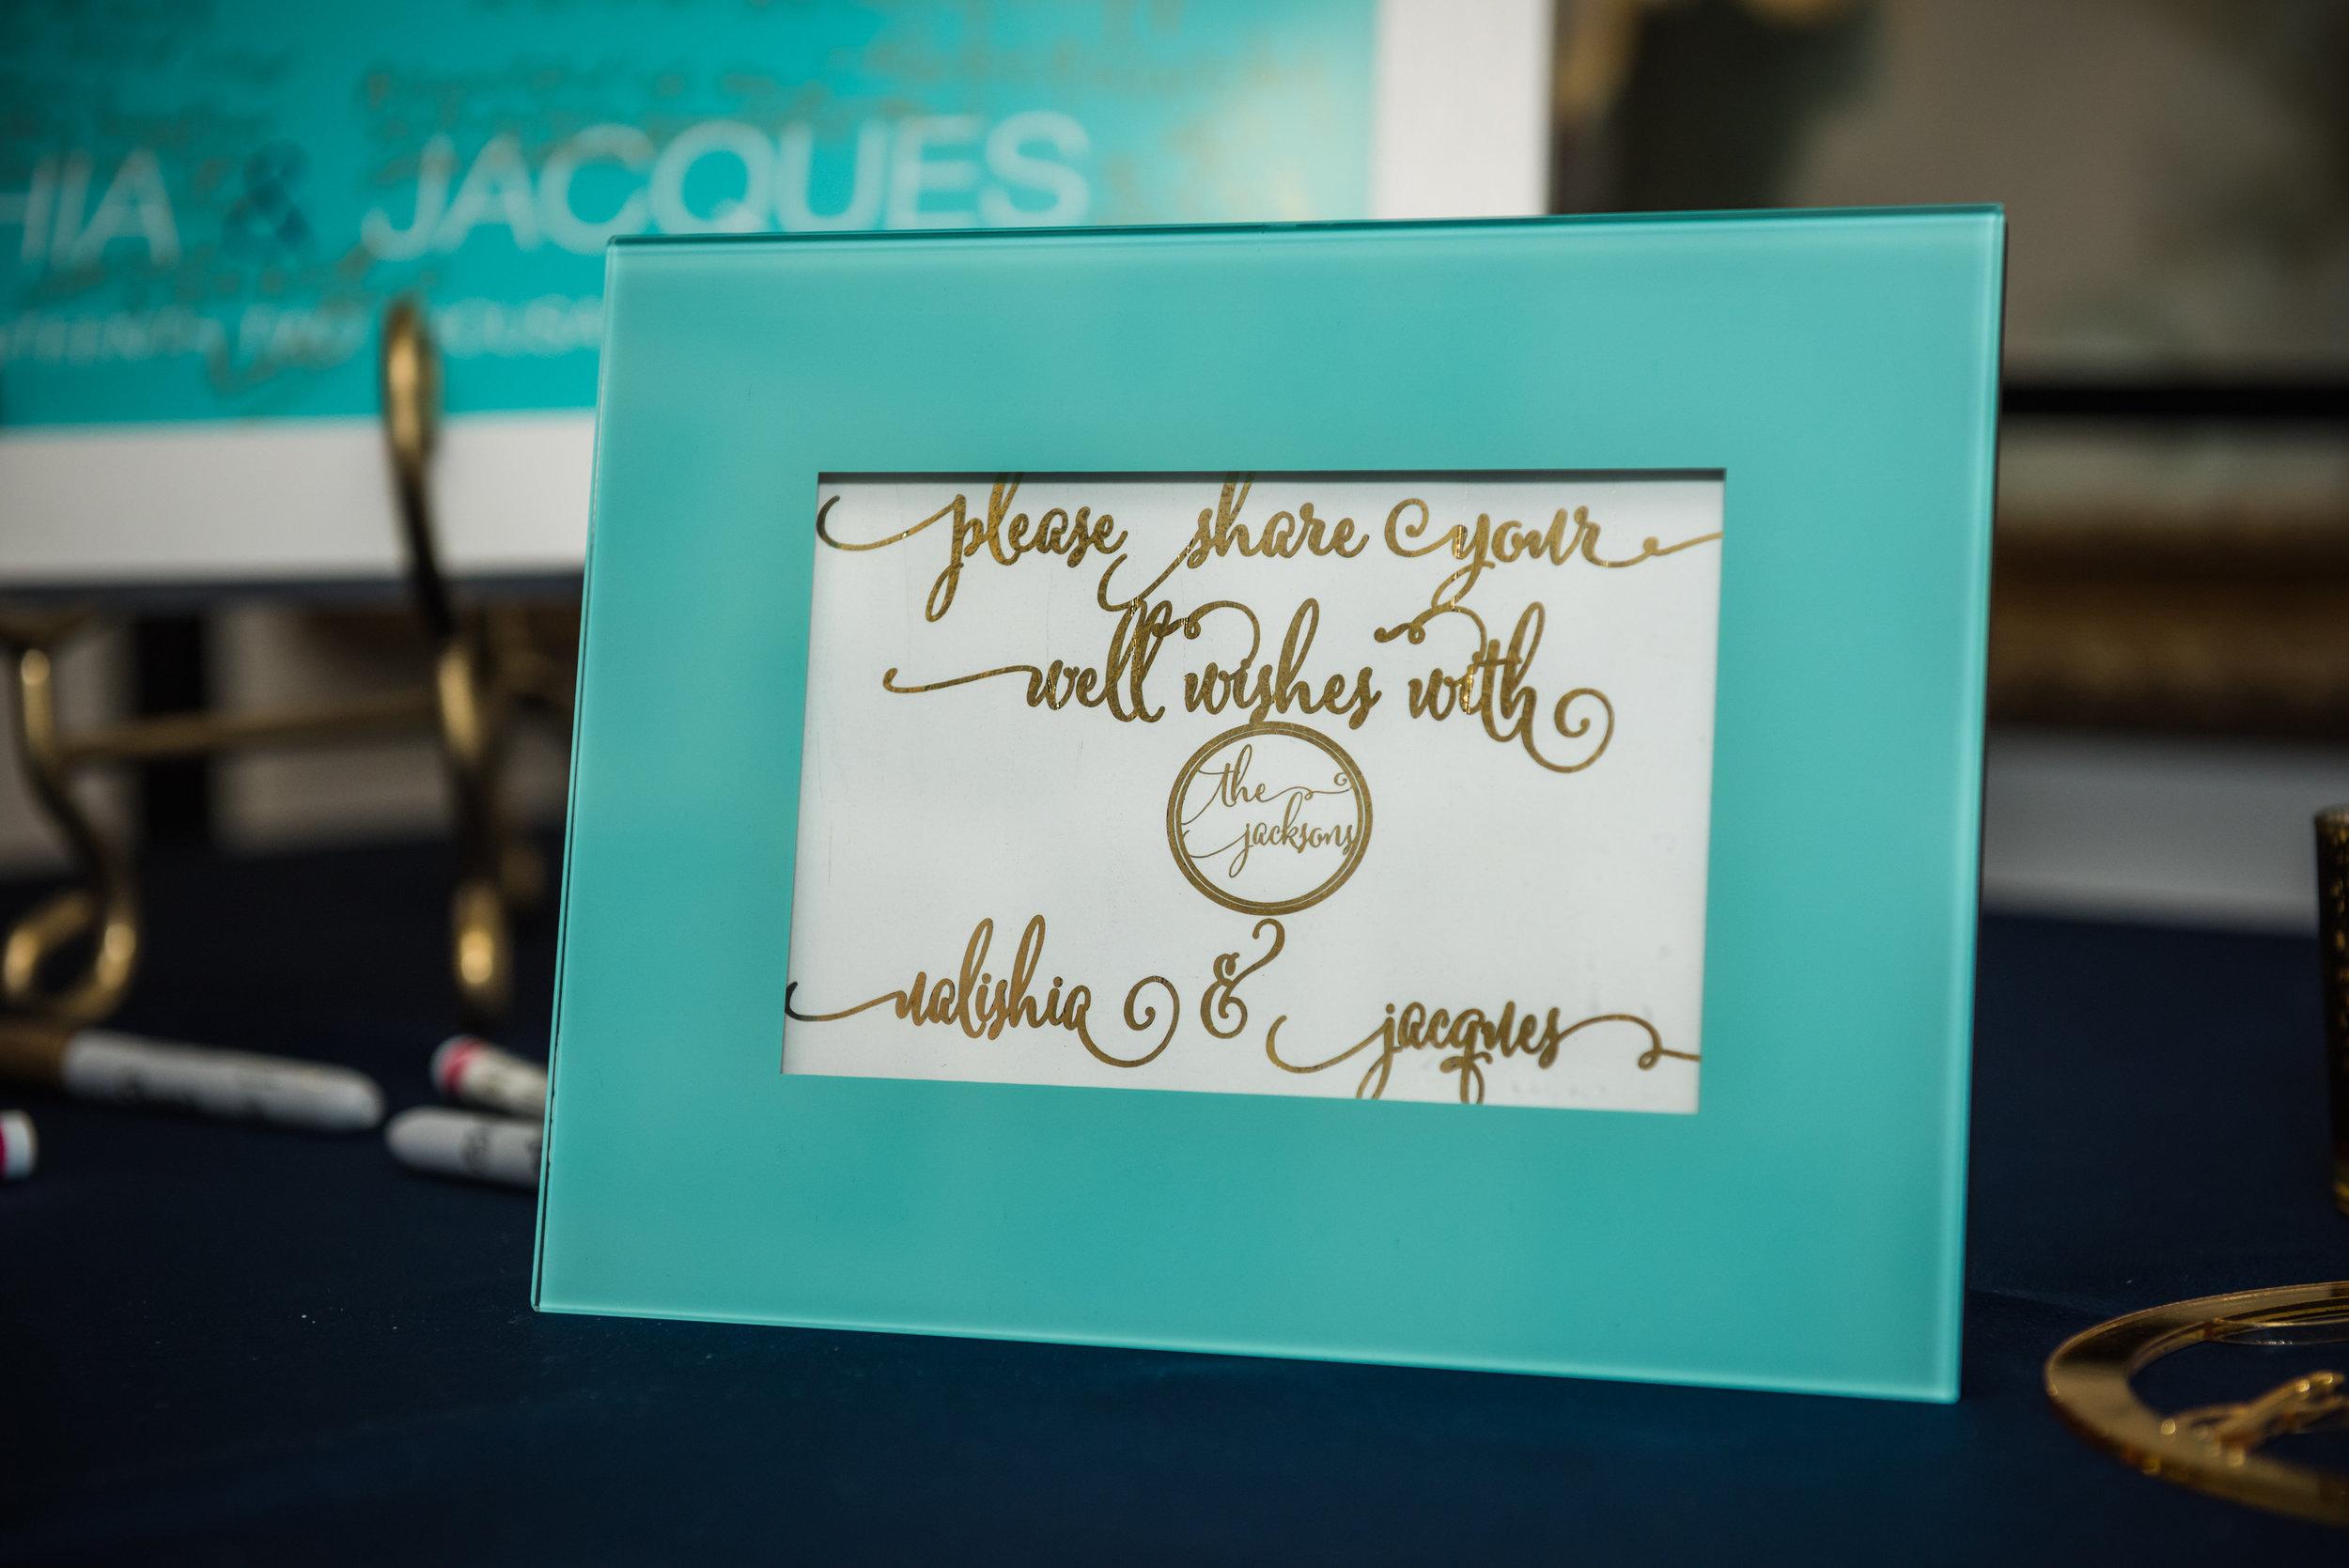 nalishia-and-jacques-reception-details-31.jpg